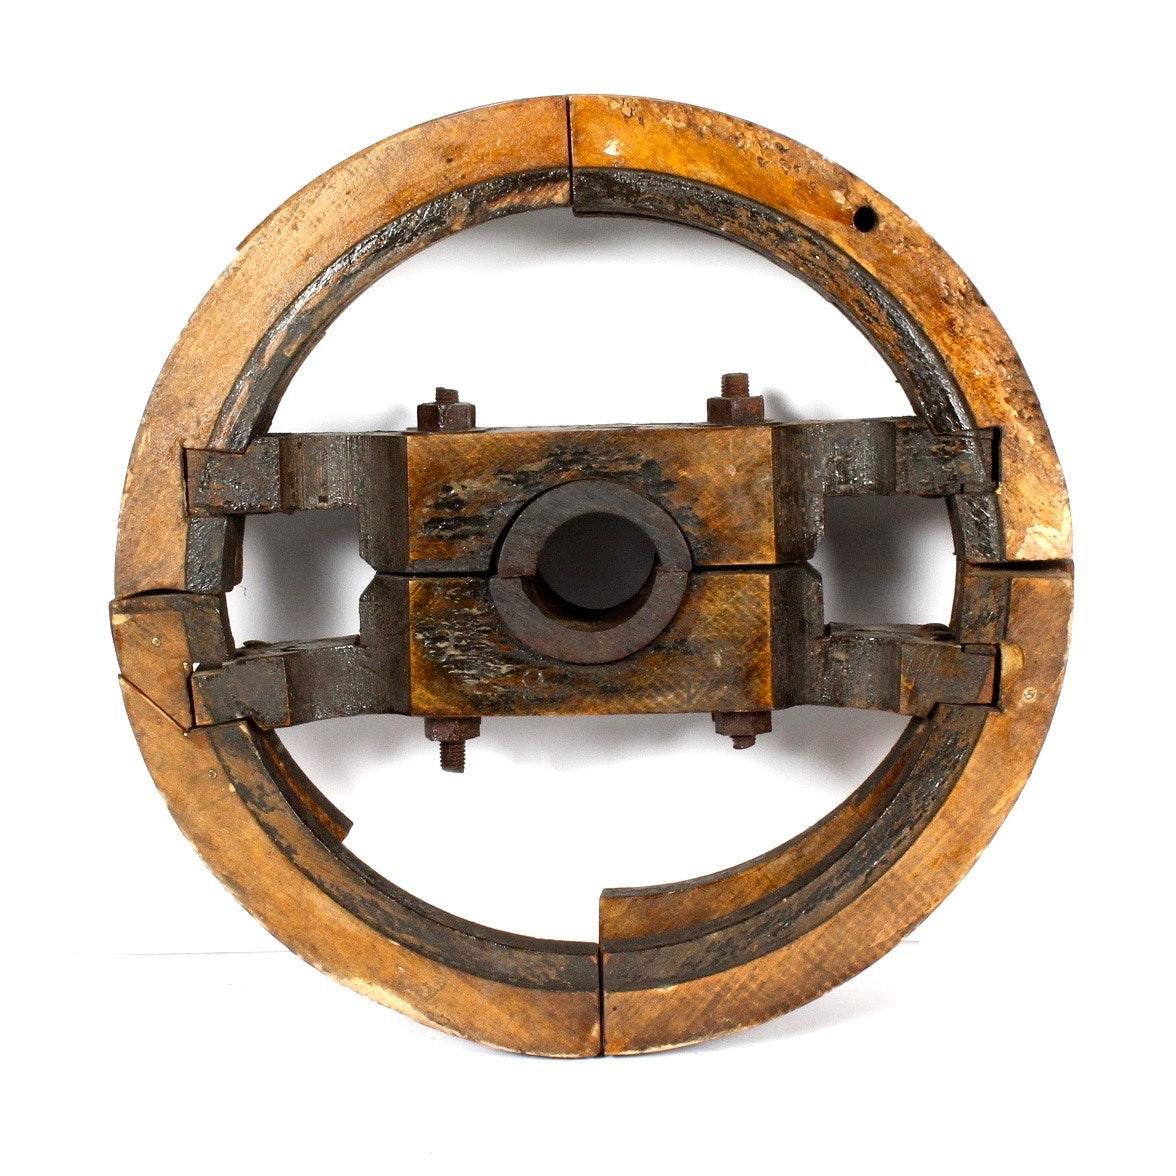 Antique Industrial Factory Wheel